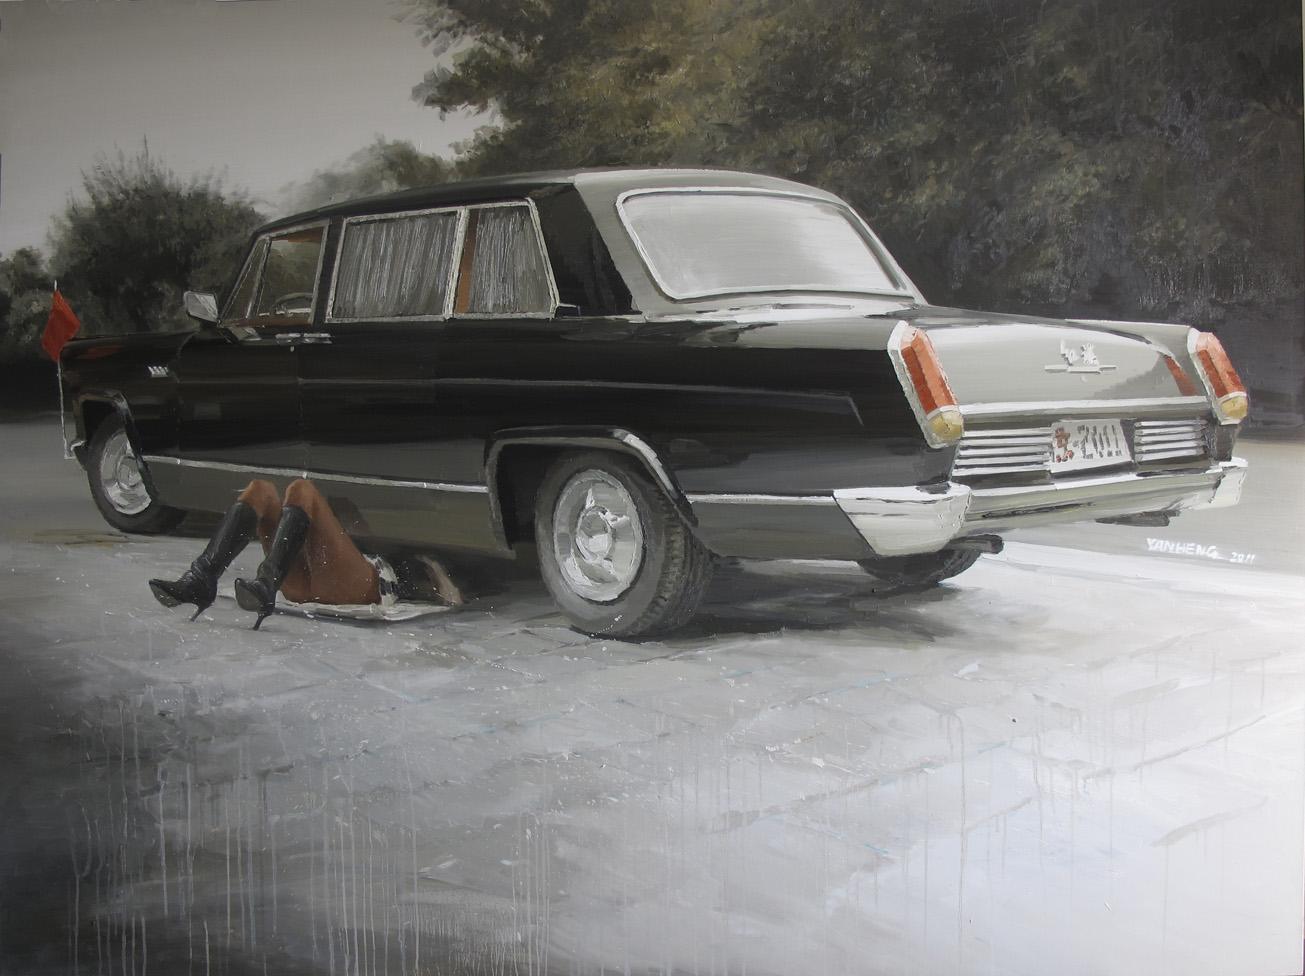 Yan Heng 闫珩, Misplaced Joke 错位的玩笑, 2011, Oil on canvas 布面油画, 200 x 150 cm